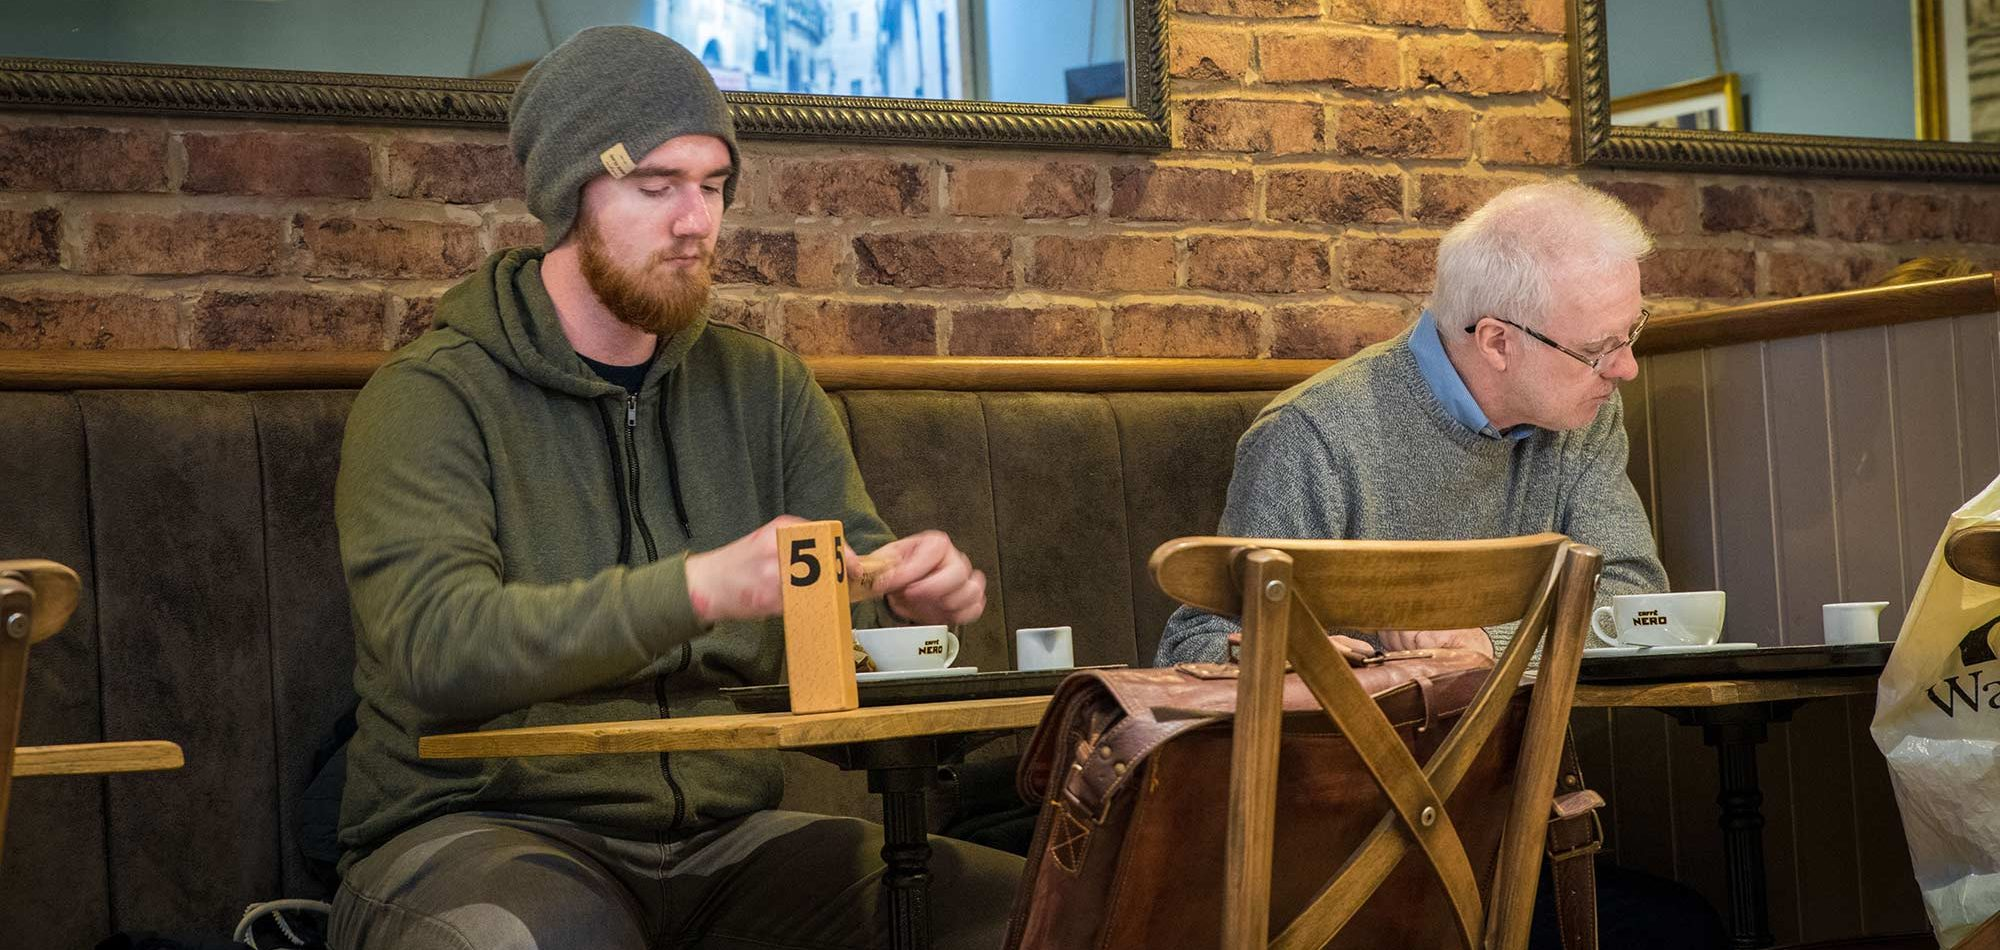 cafe inverness escocia roadtrip siredwards